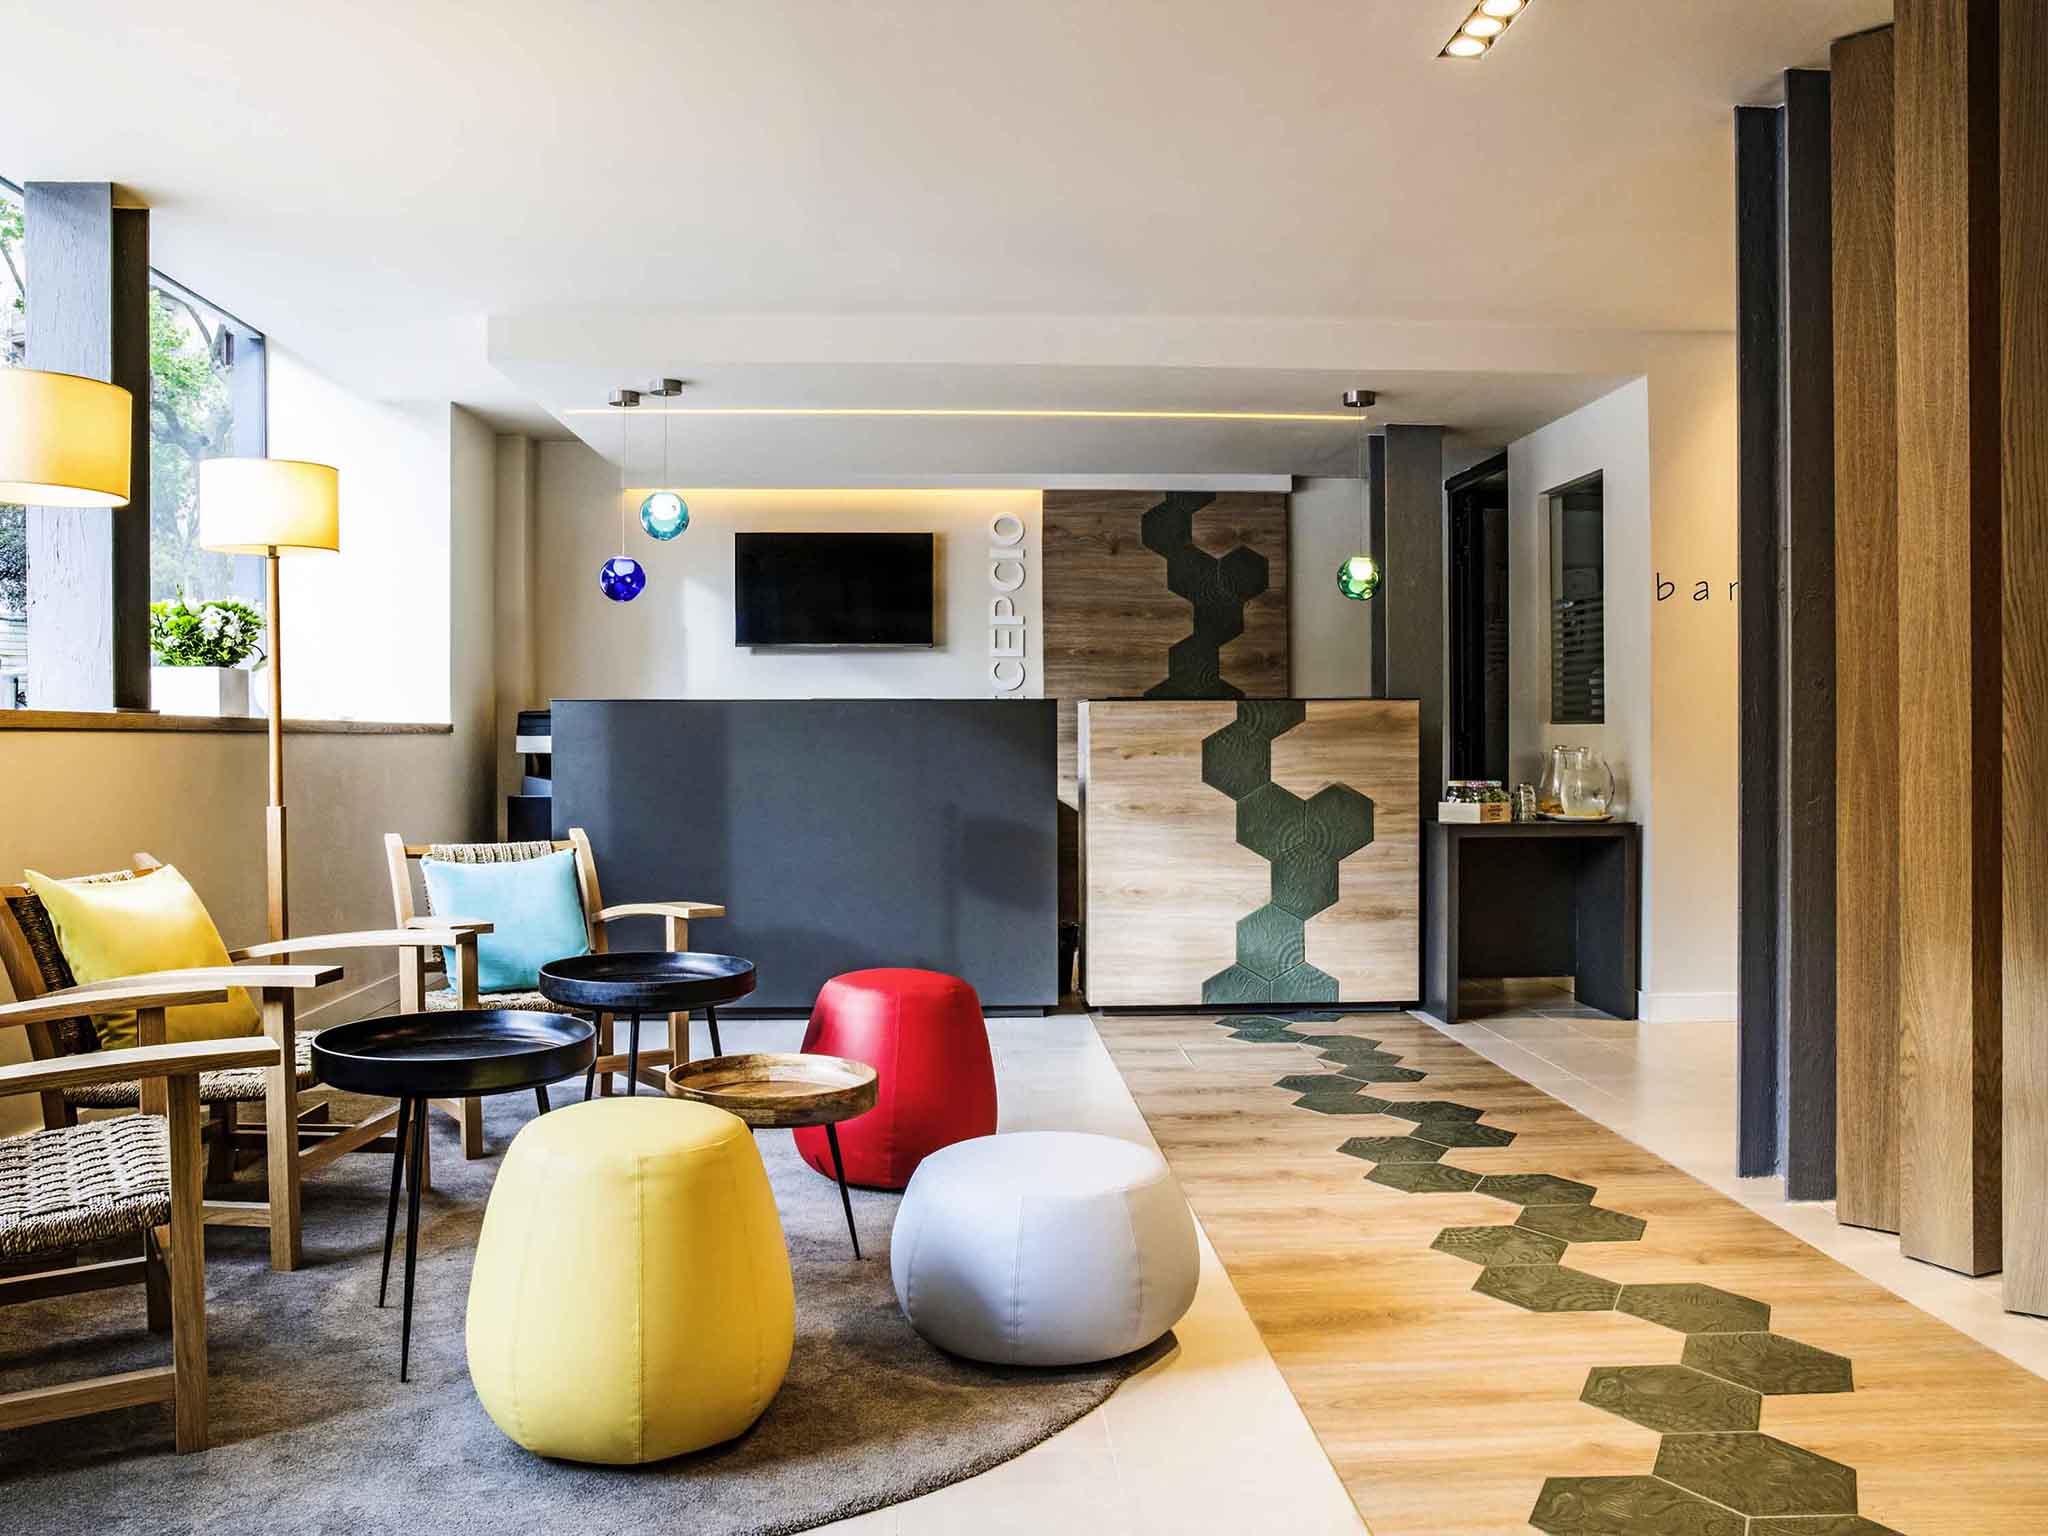 Otel – ibis Styles Barcelona Centre